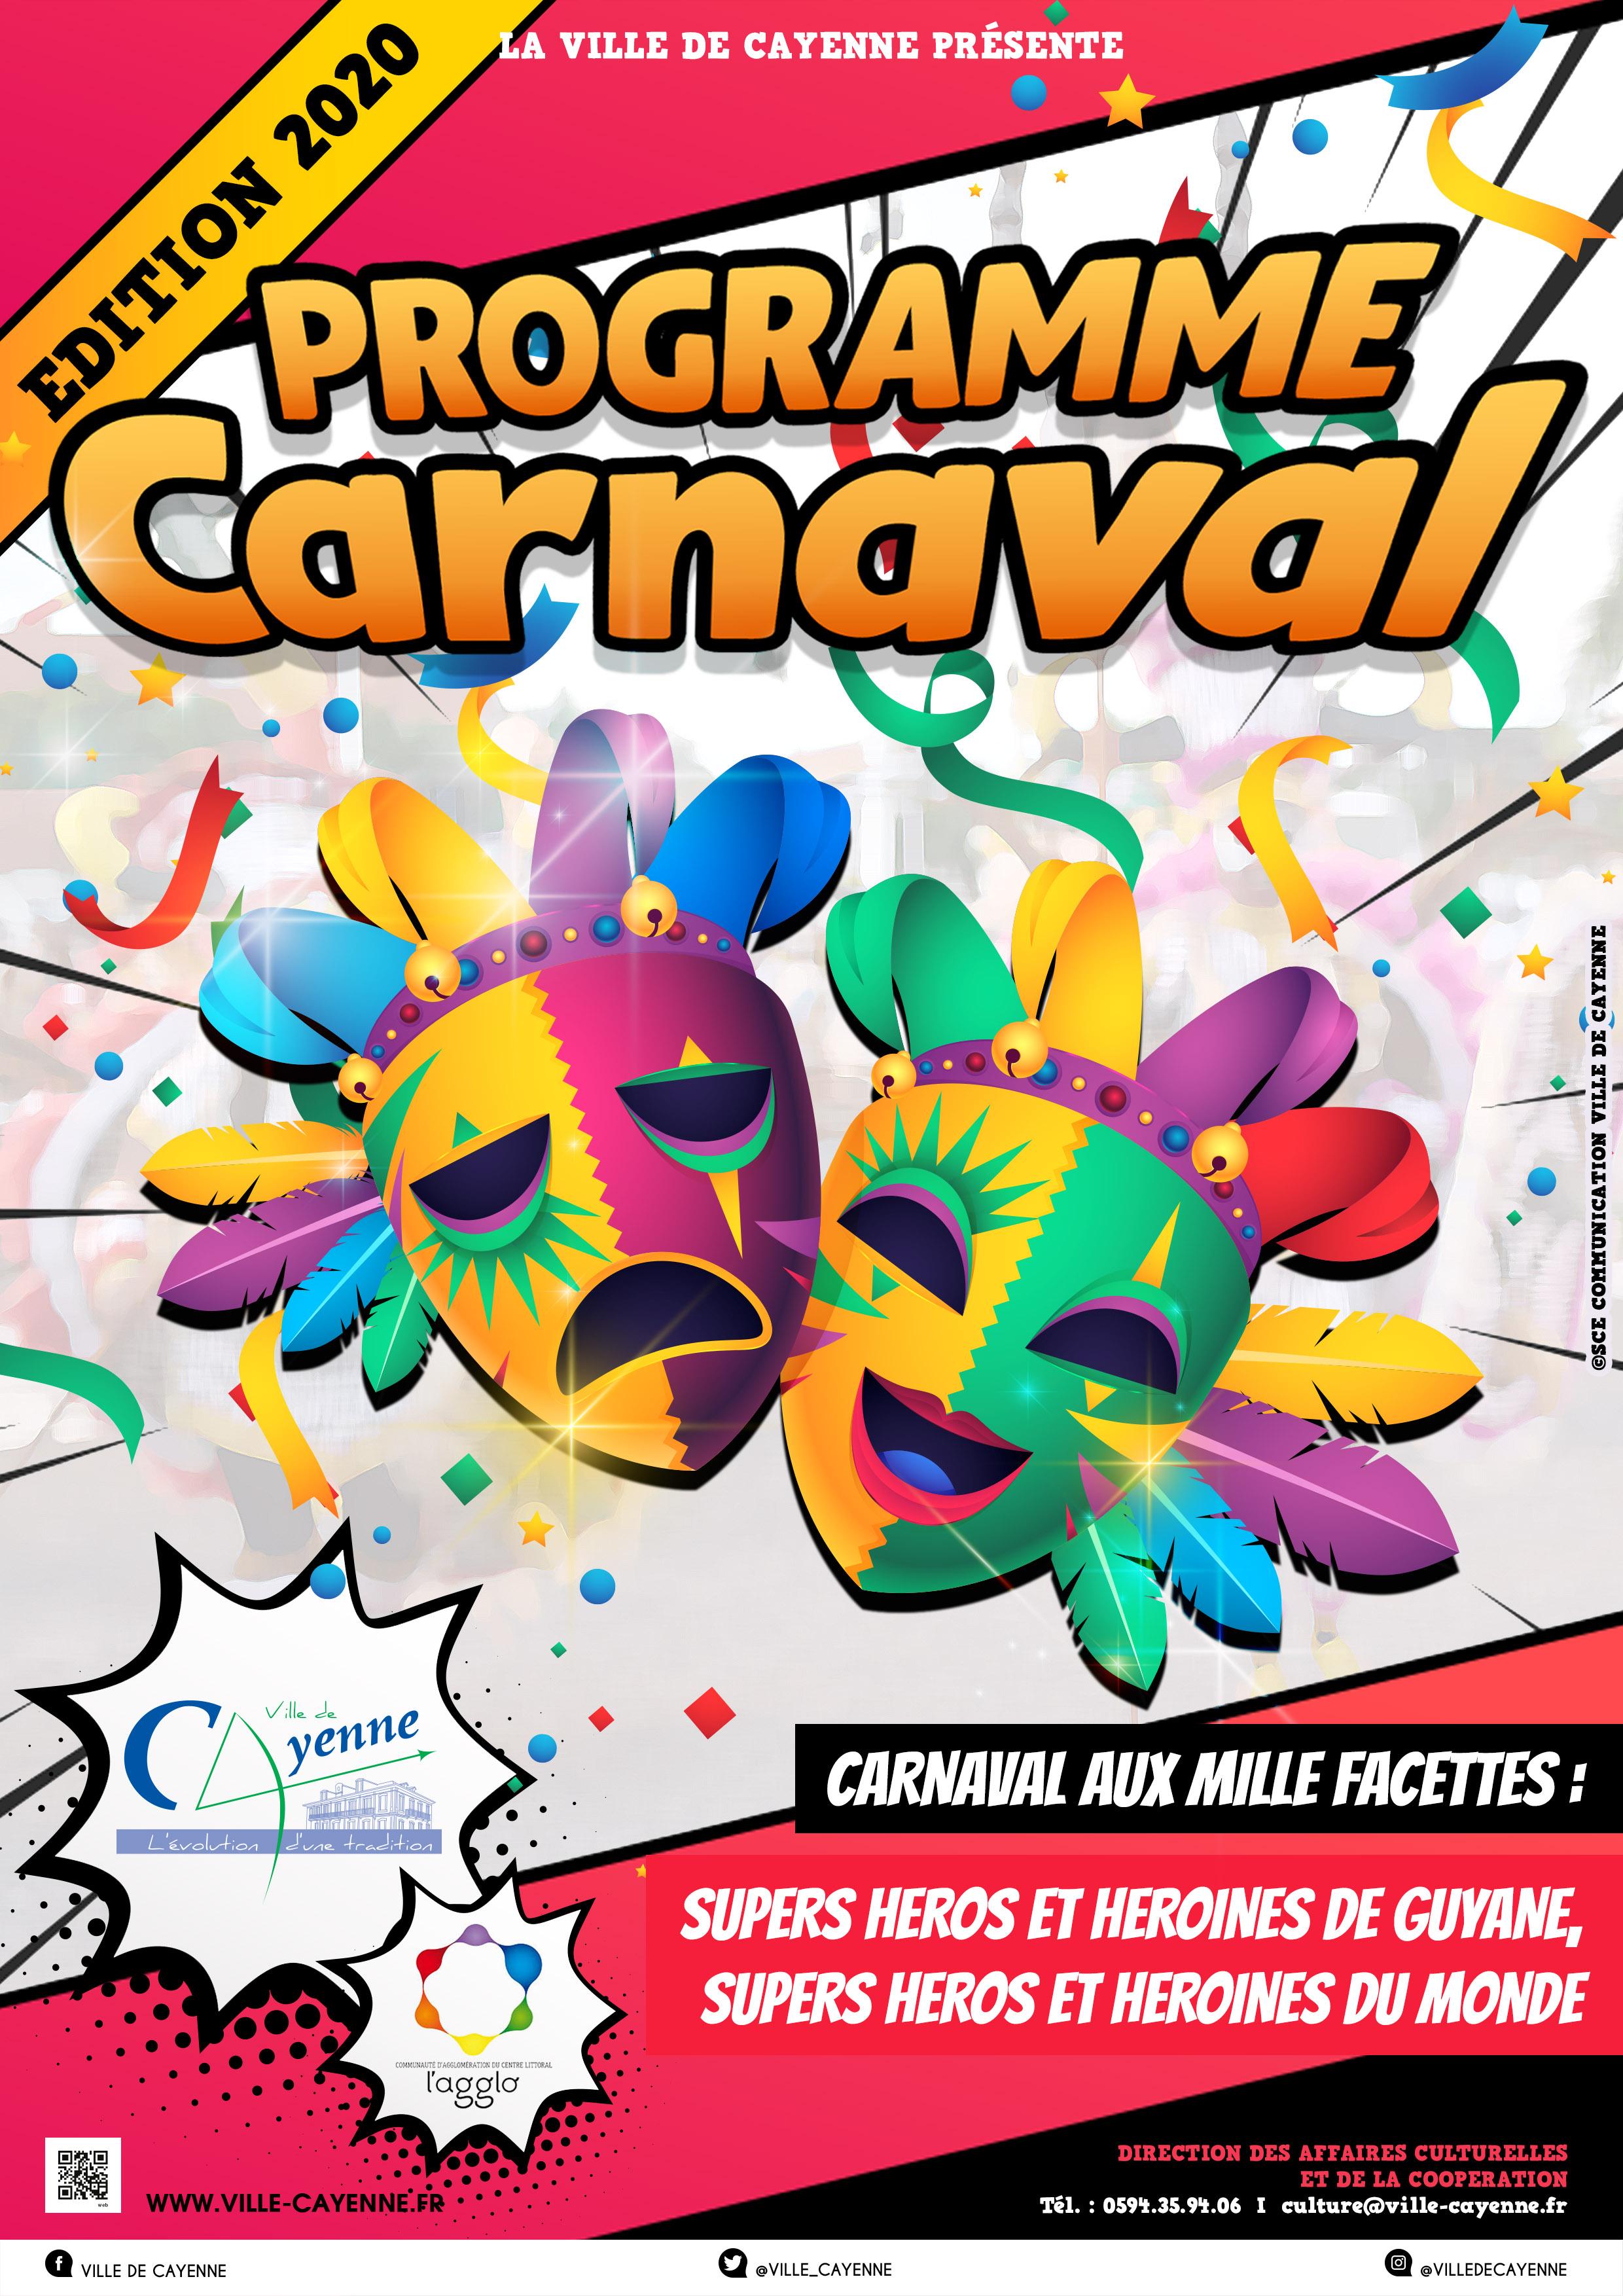 Programme Carnaval